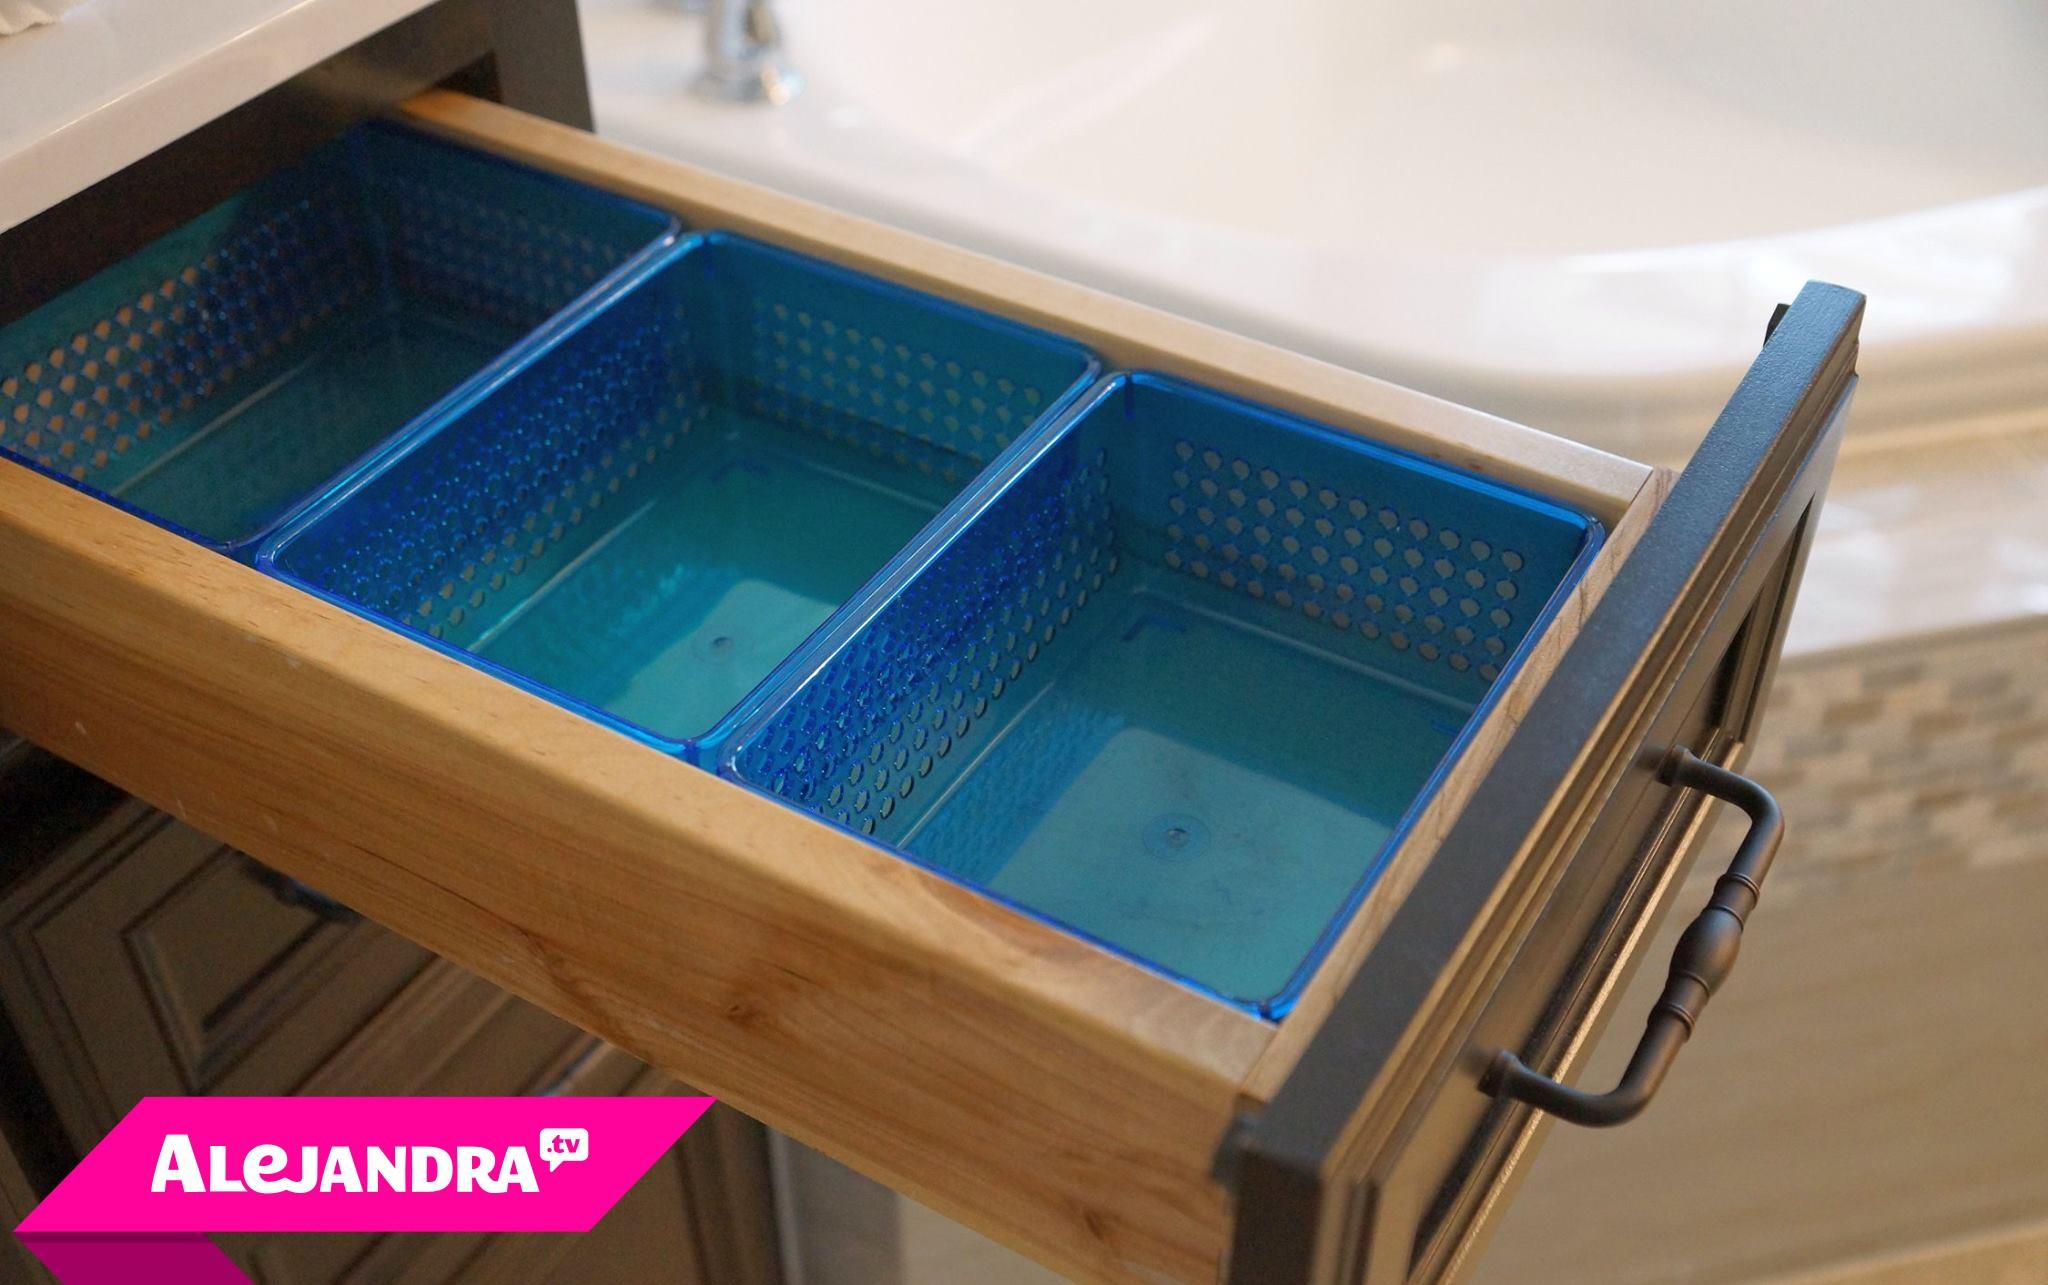 Luxury Bathroom Drawer organizer Décor